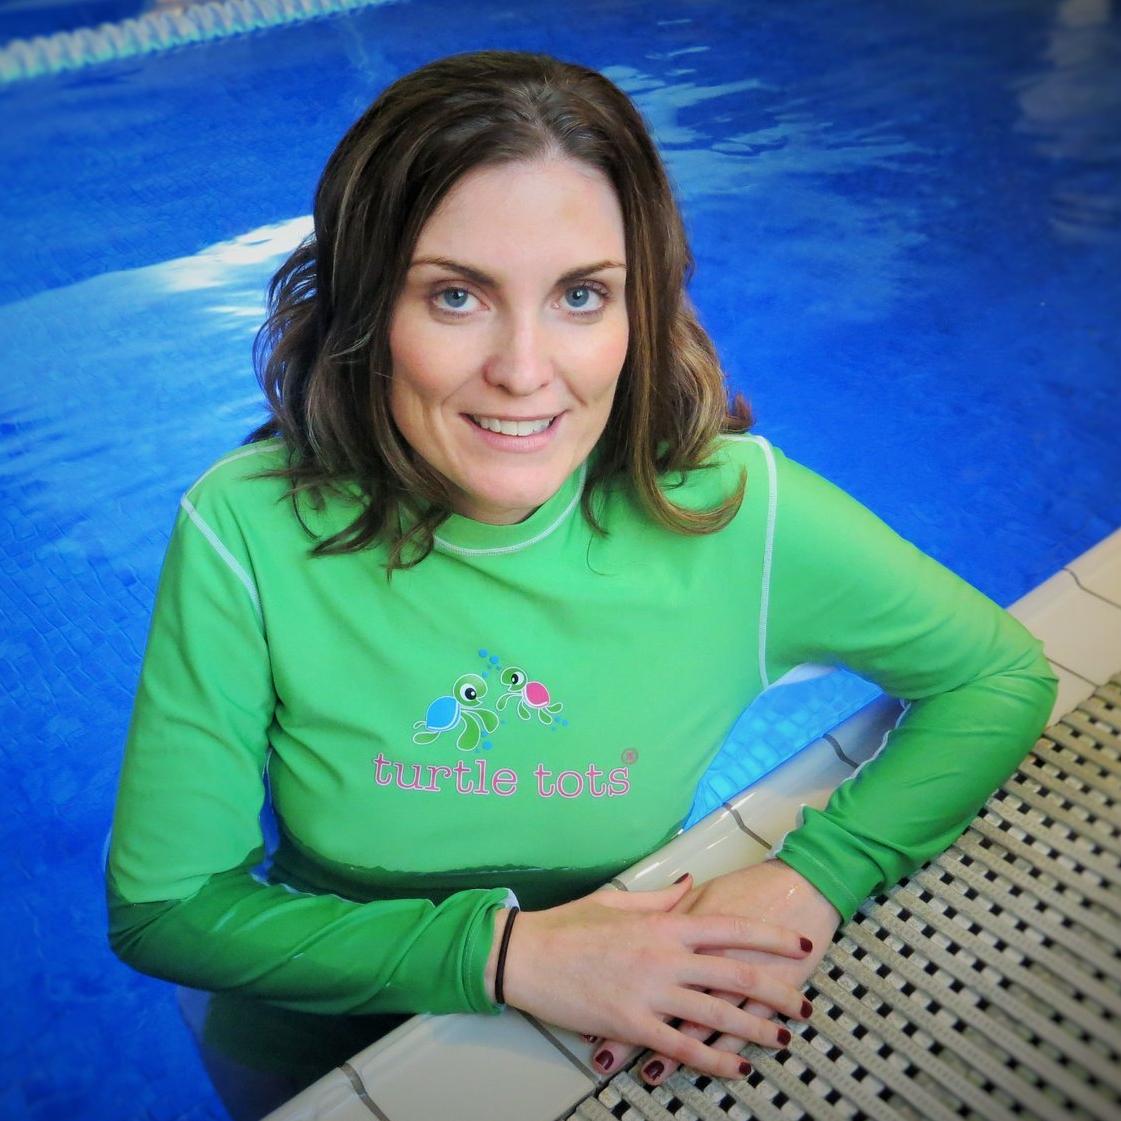 Vicky Muirhead